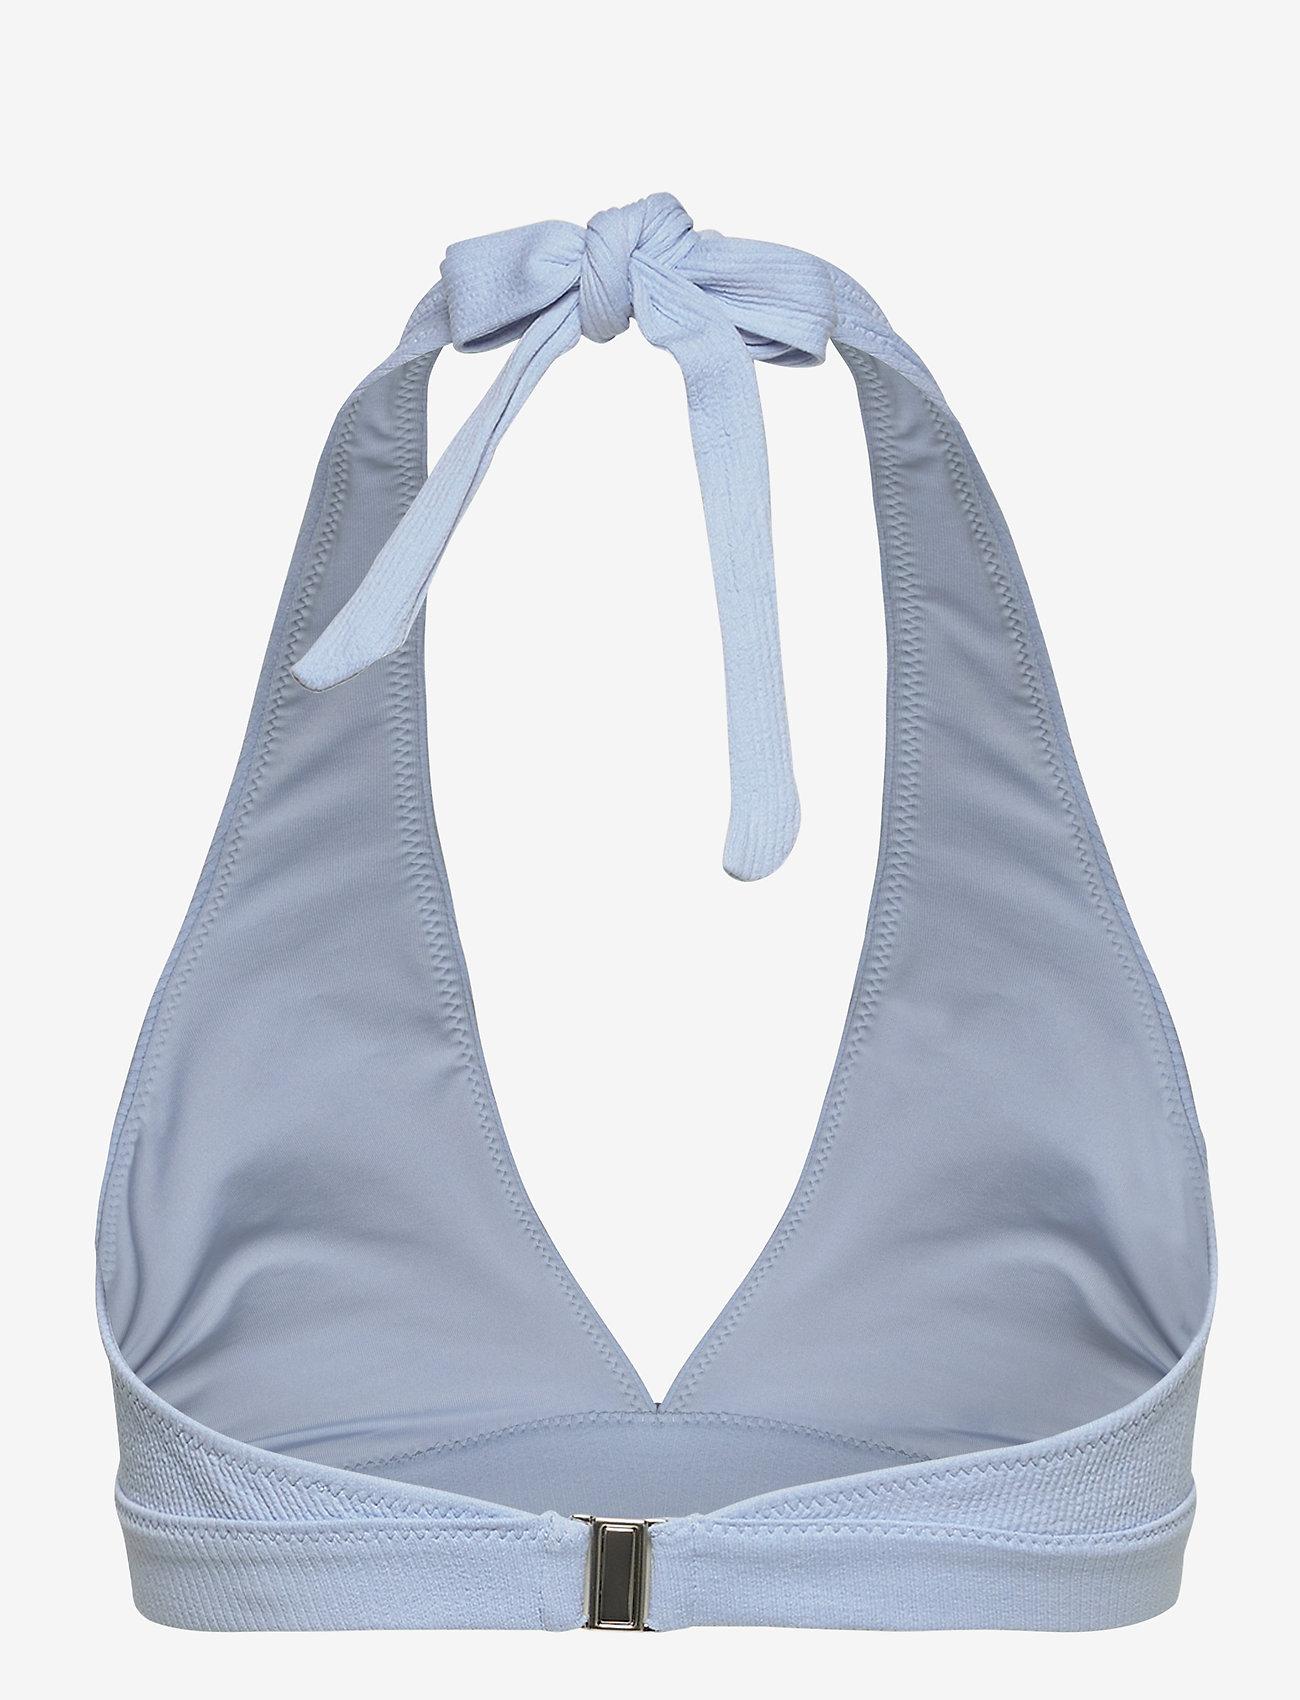 Ganni - Recycled Textured - bikini tops - chambray blue - 1